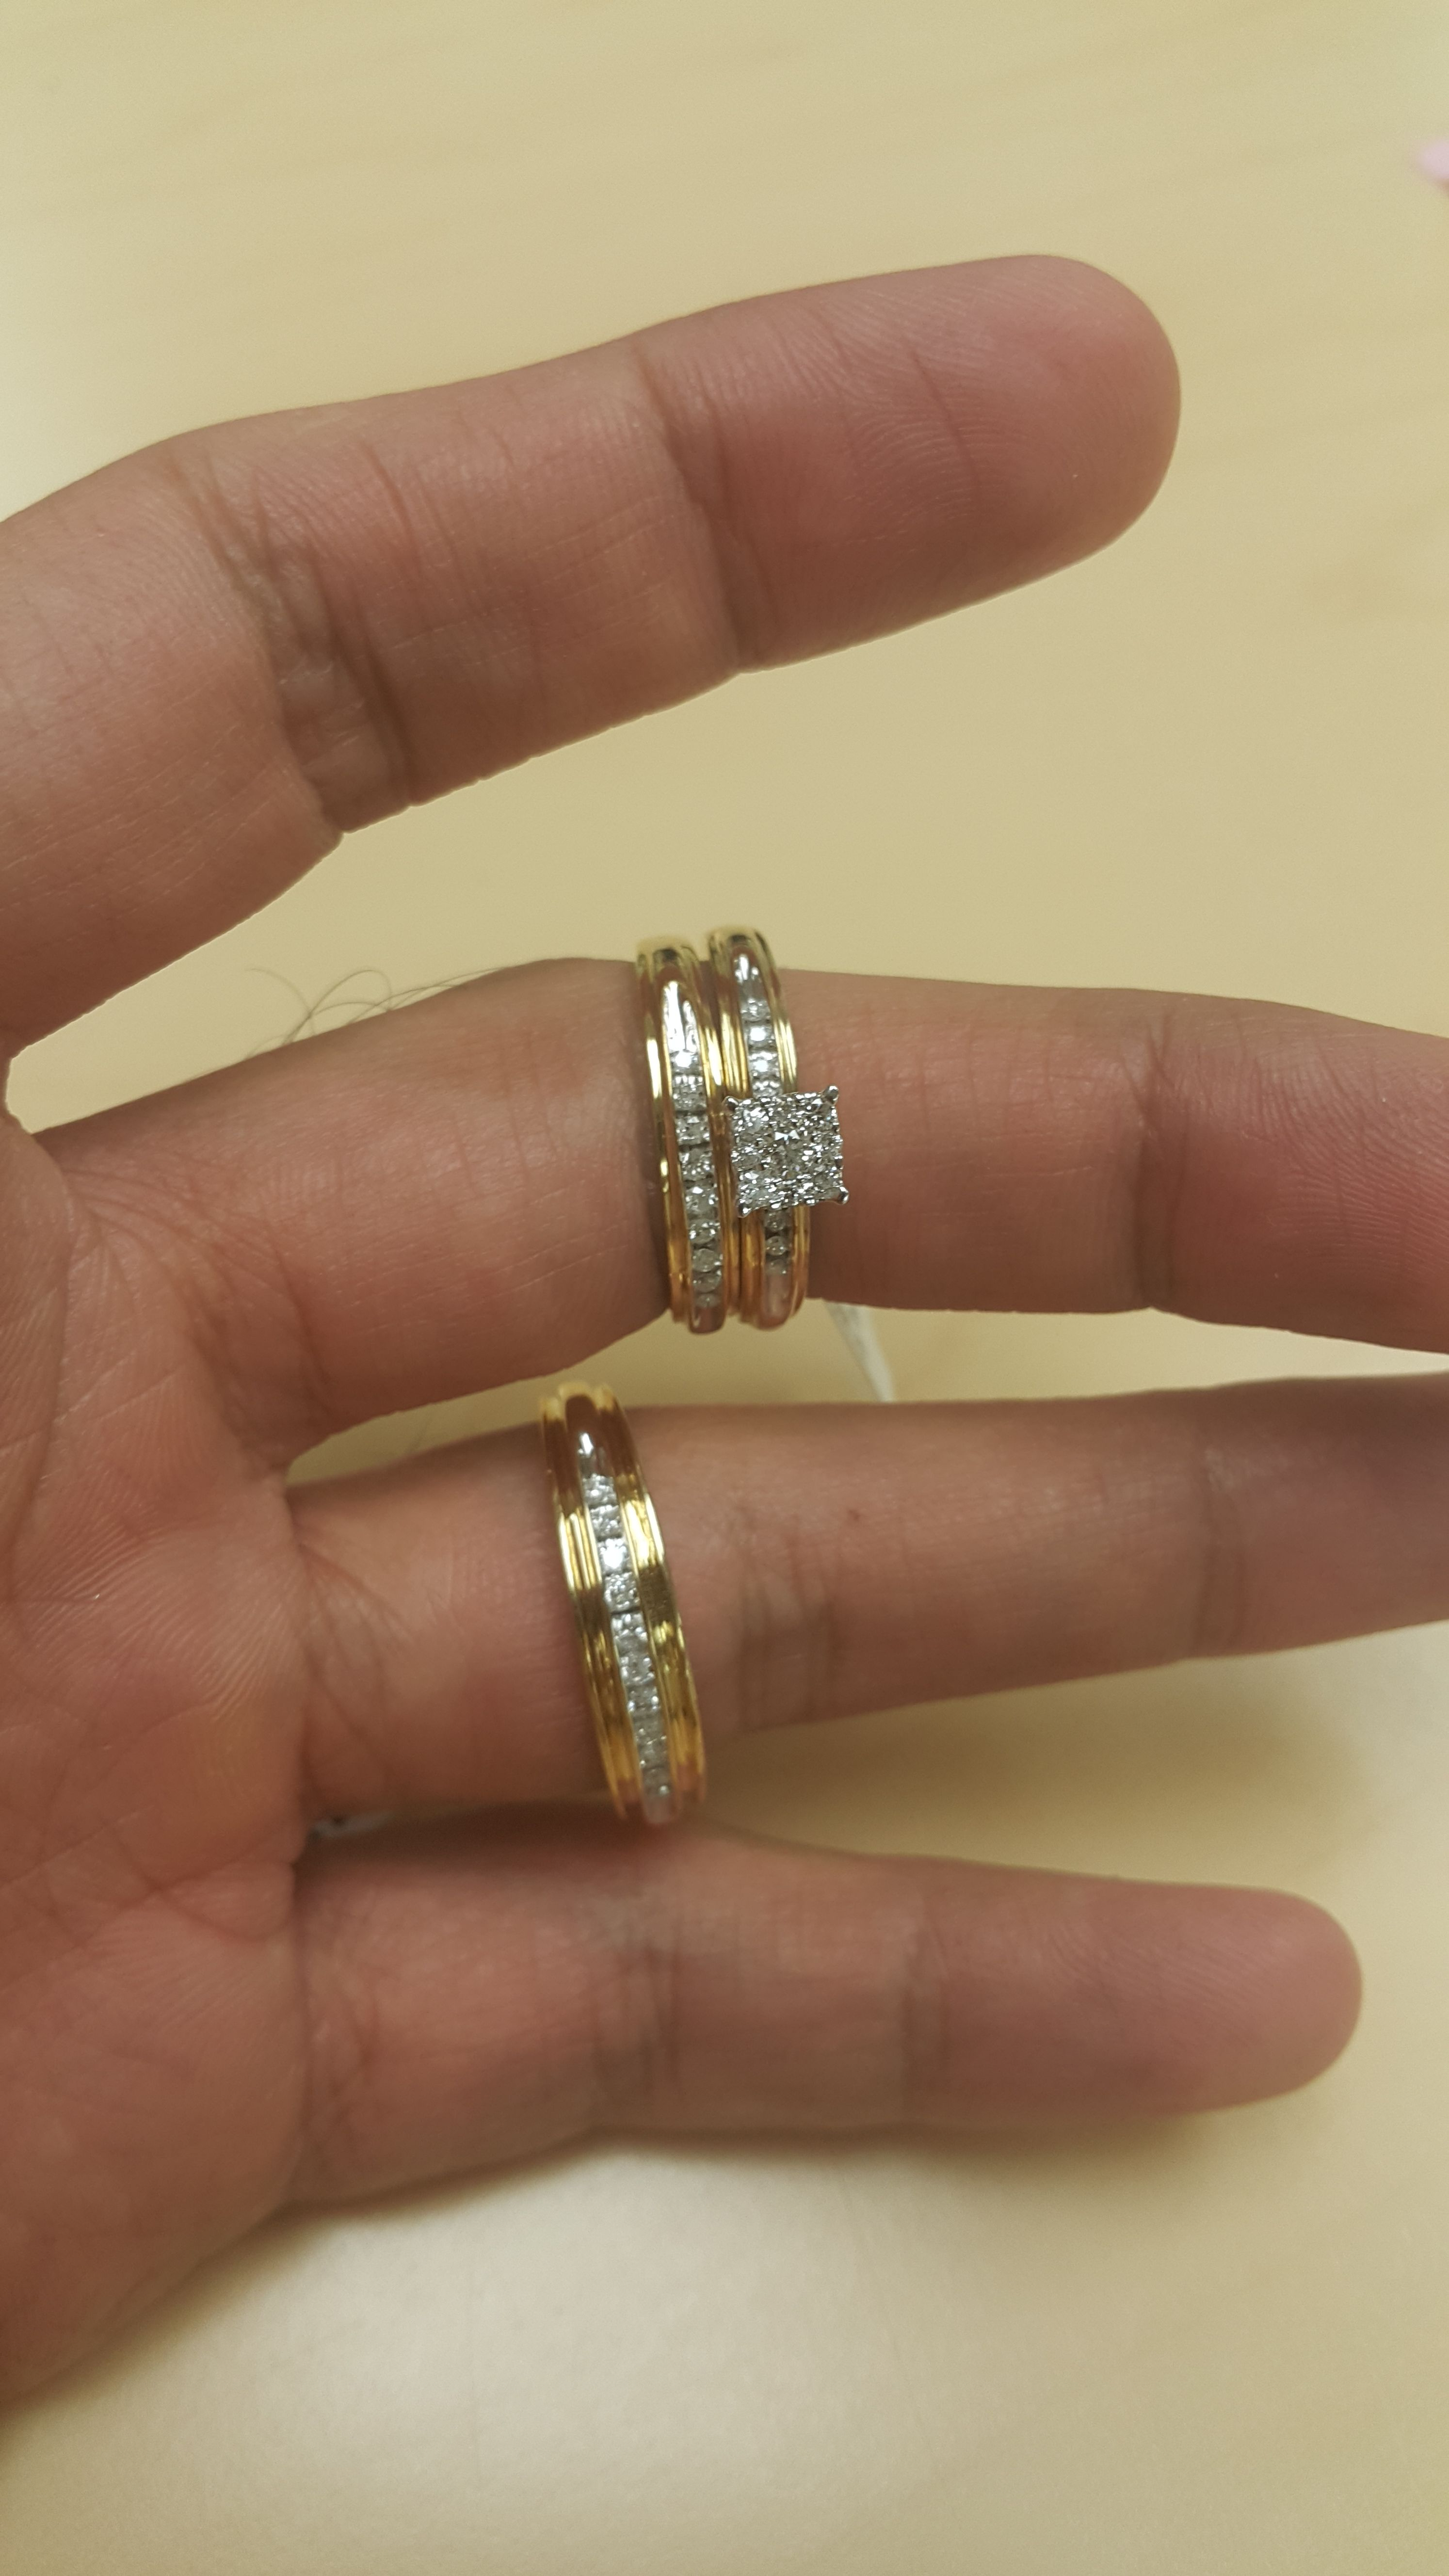 Rings On Hand Trio Ring Set Bt513y Engagement Ring Ladies